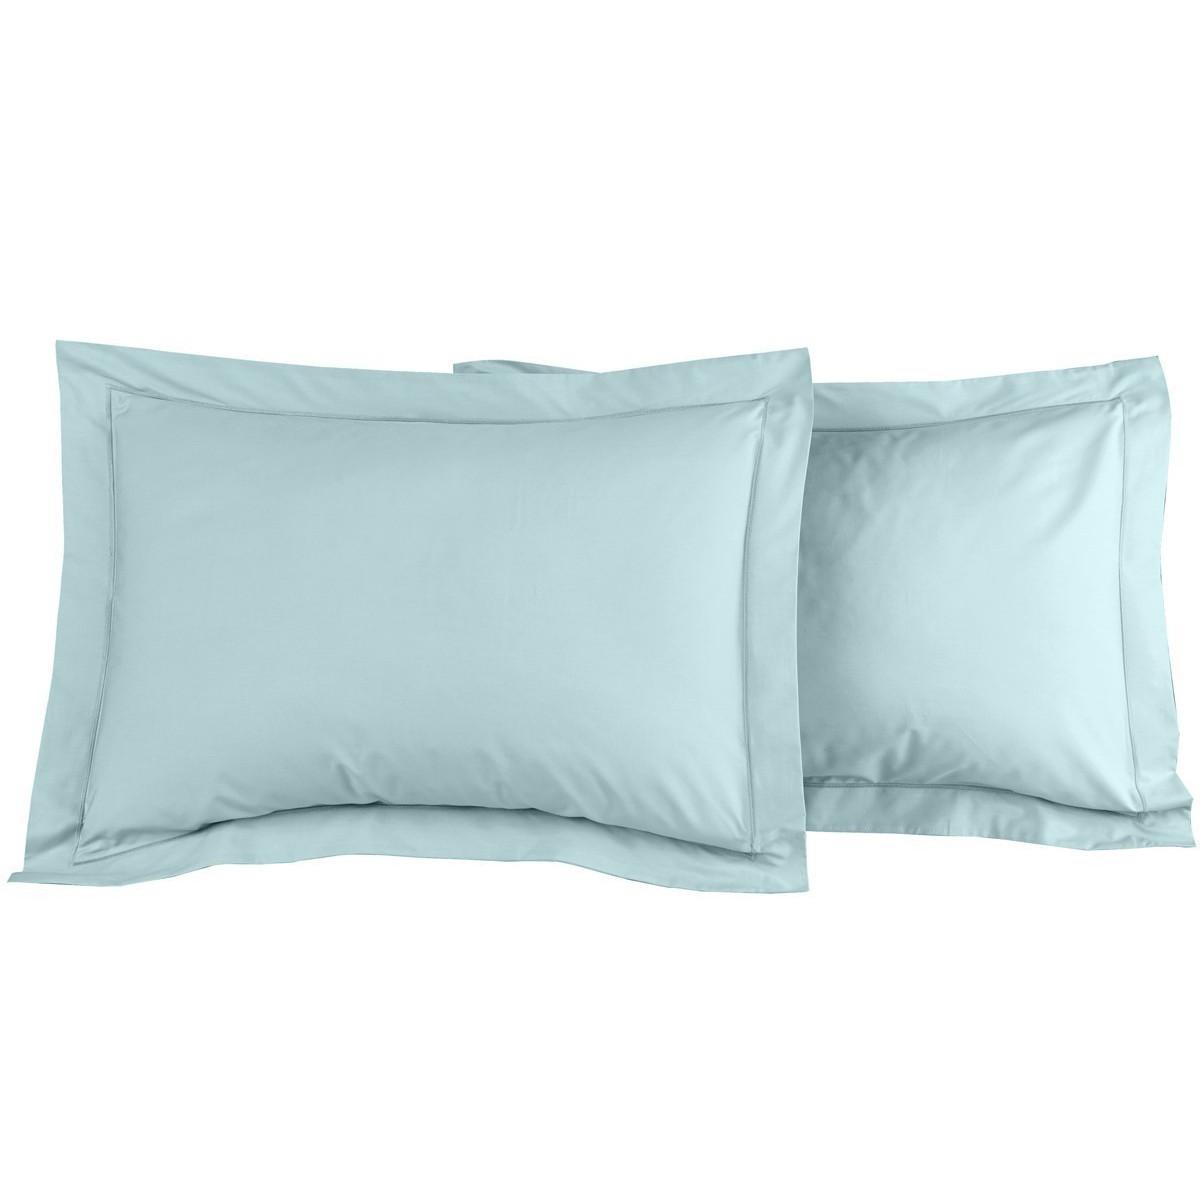 Lot de 2 taies d'oreiller en percal Bleu Arctic 50x70 cm